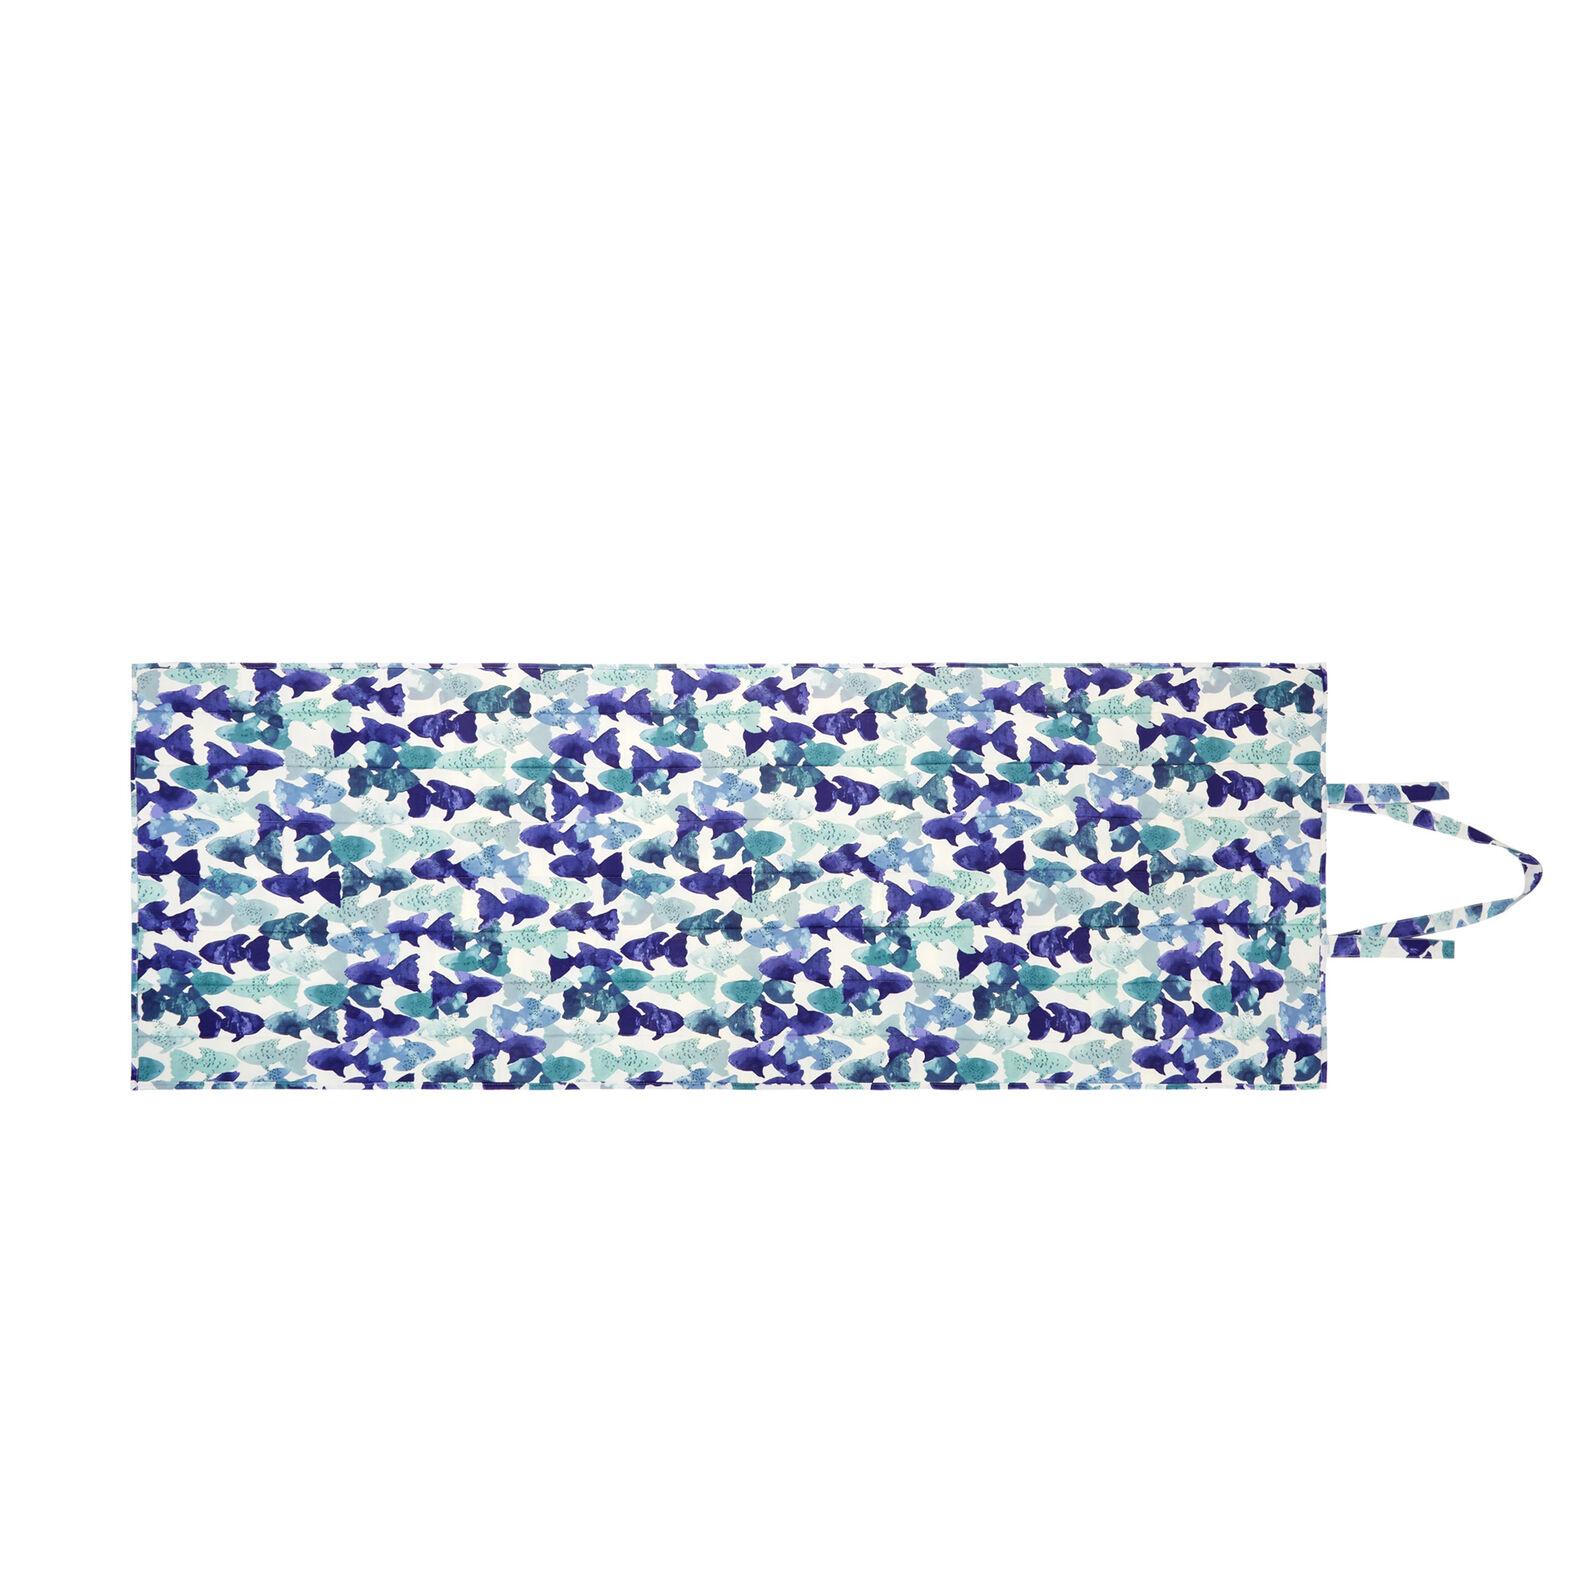 Mattress with fish print